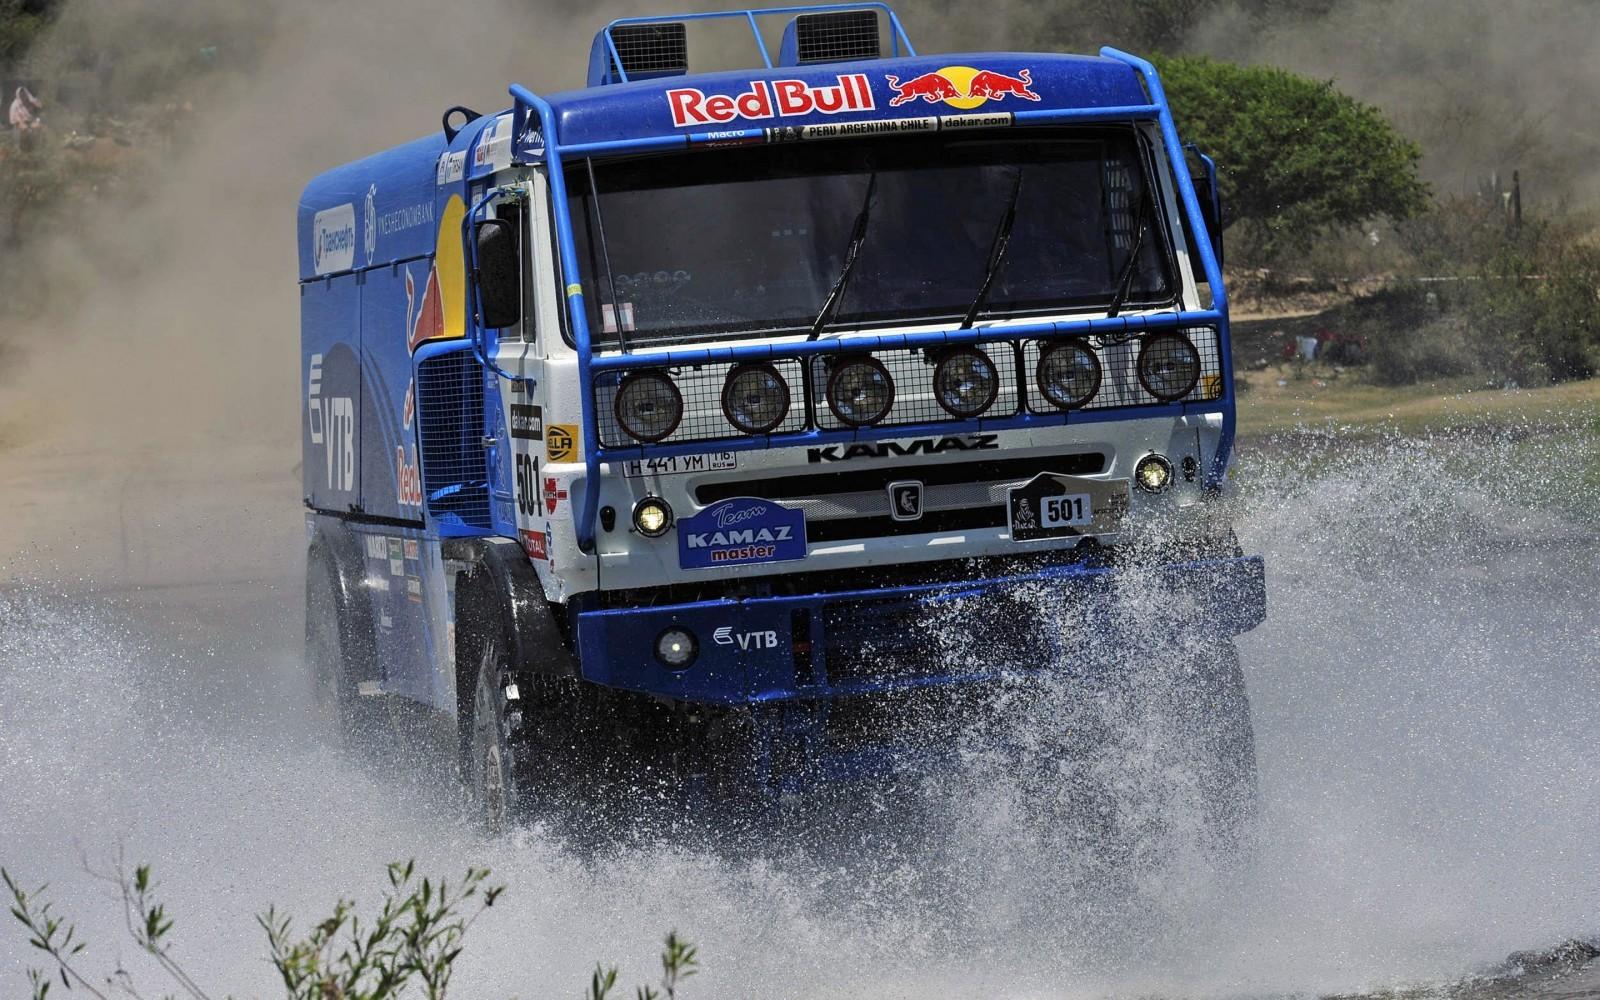 Unimog Nemesis - Red Bull KAMAZ 4911 - Dakar T4 Hero  21